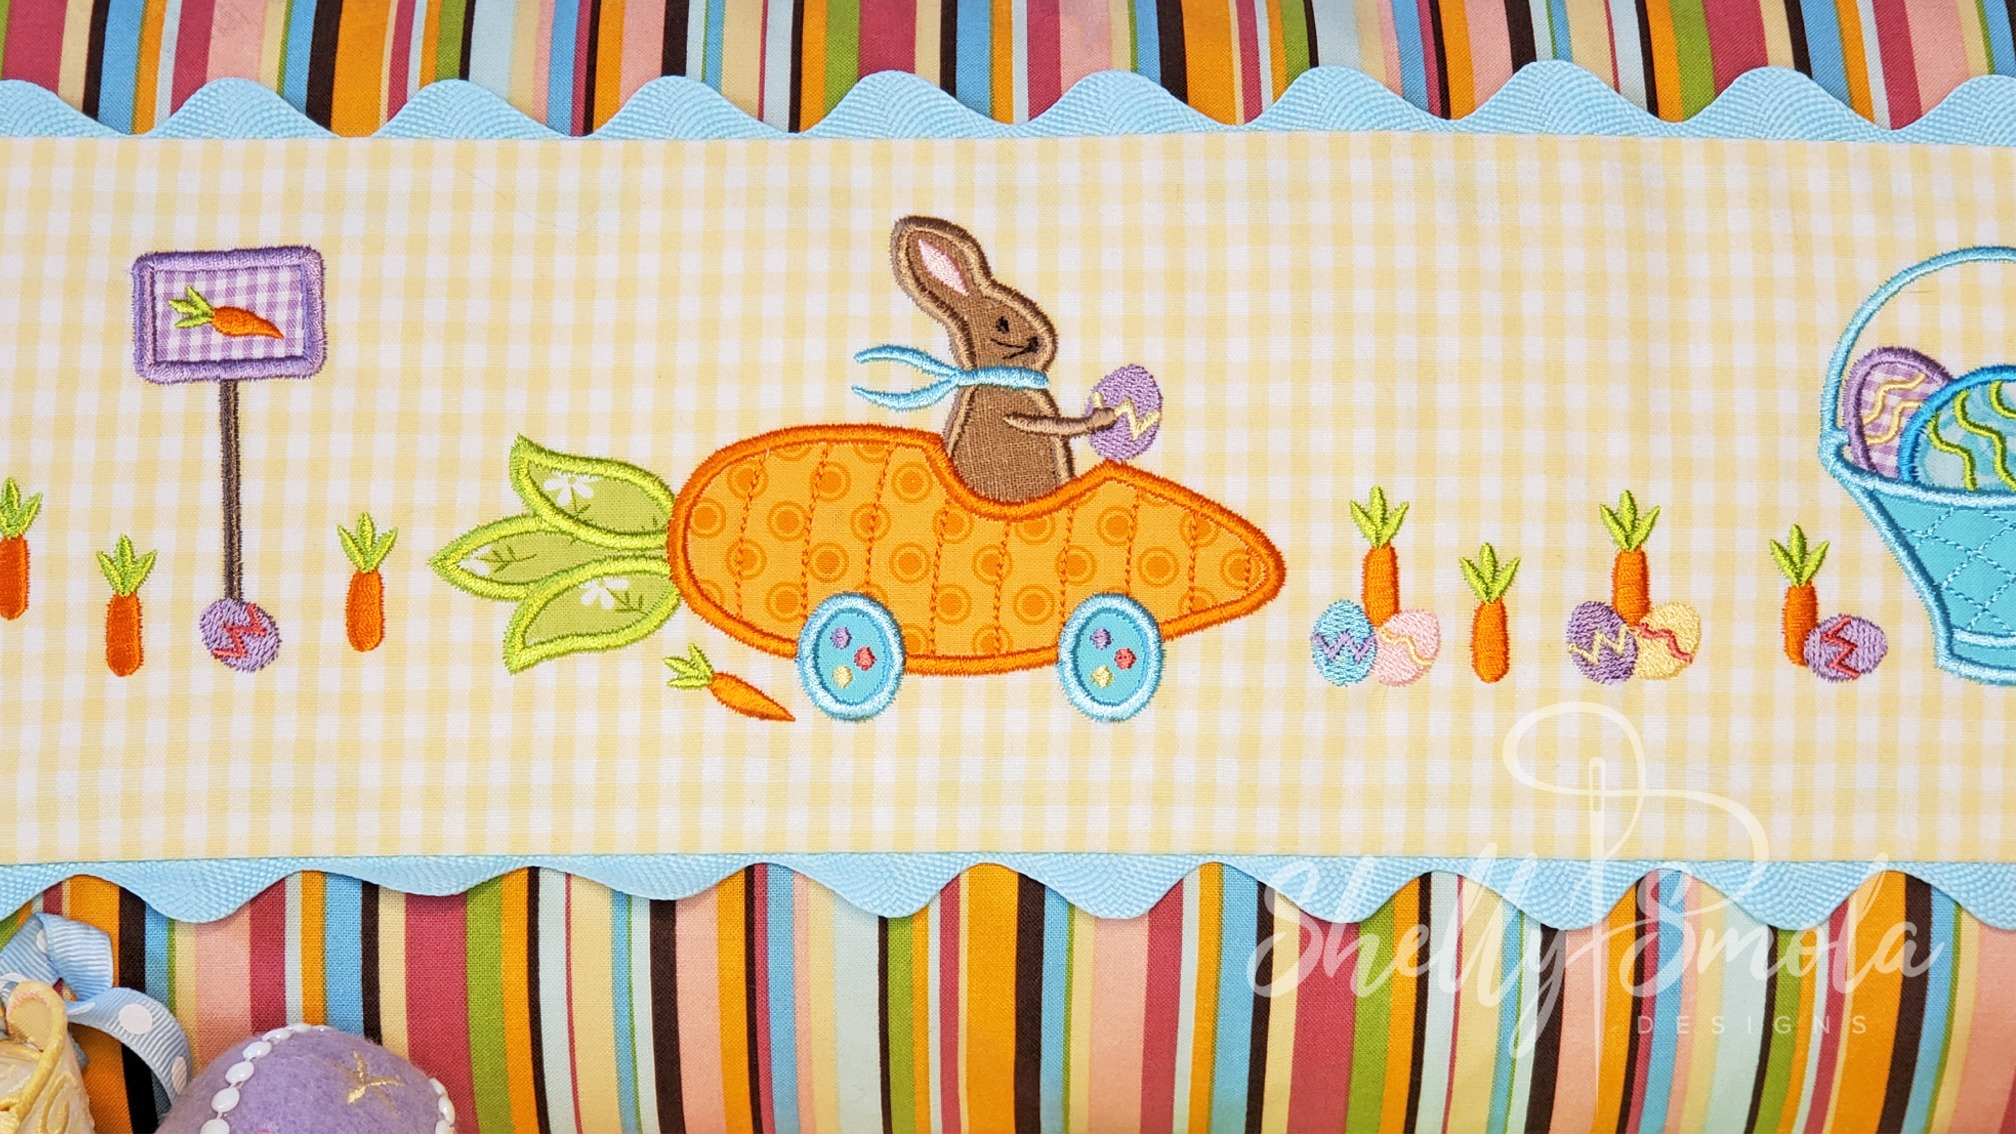 Go Bunny by Shelly Smola